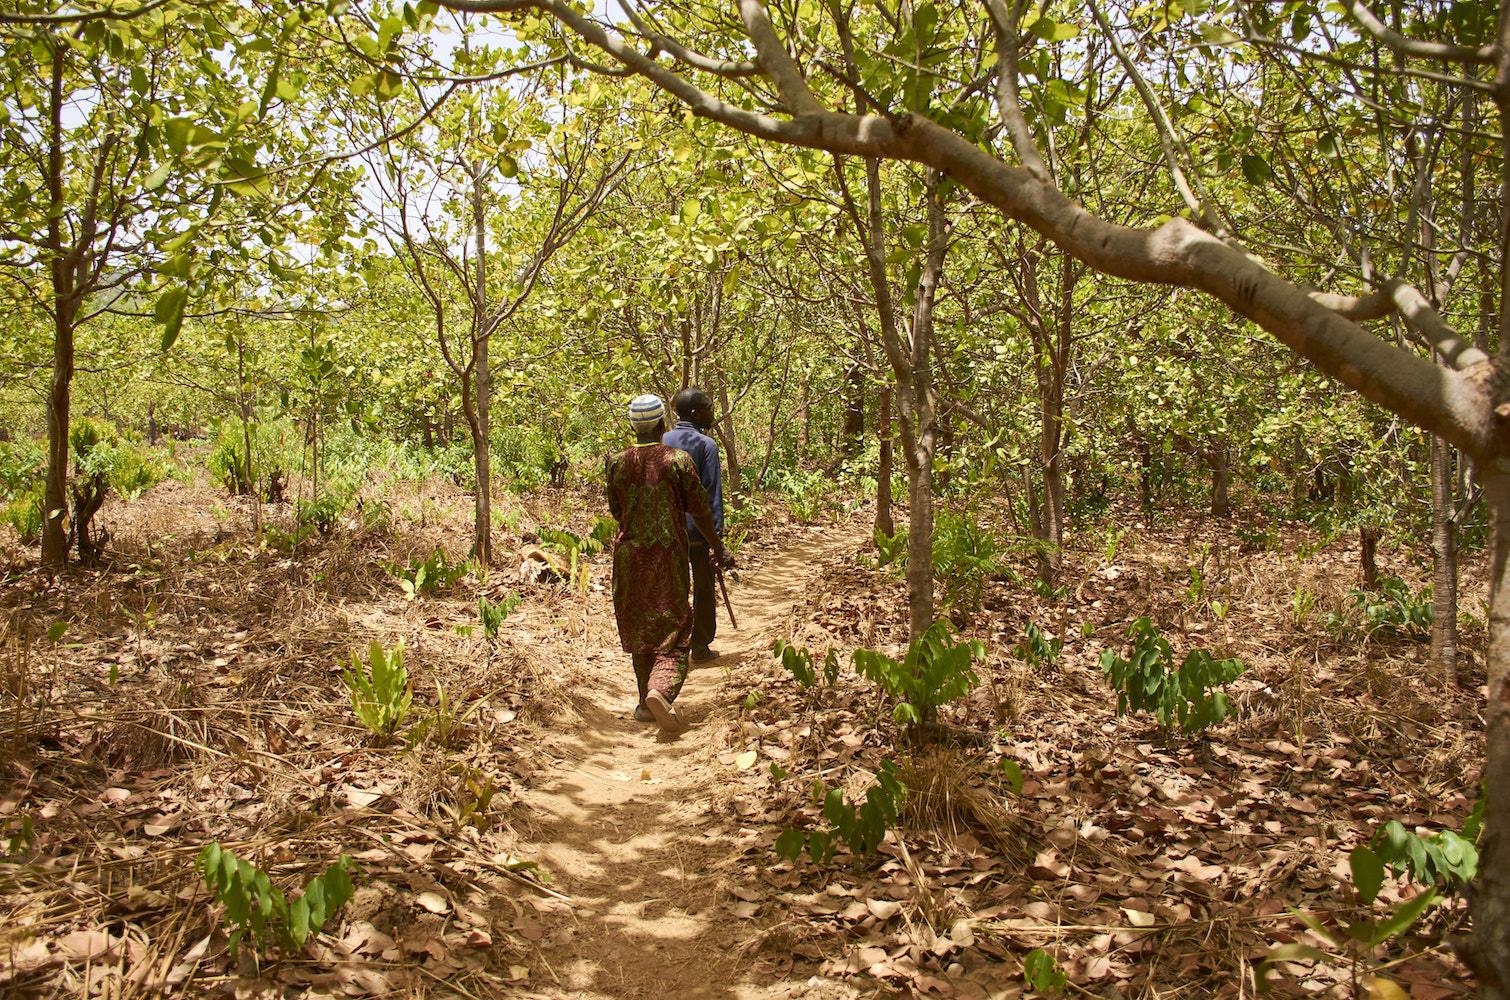 Bauxite mining and Chinese dam push Guinea's chimpanzees to